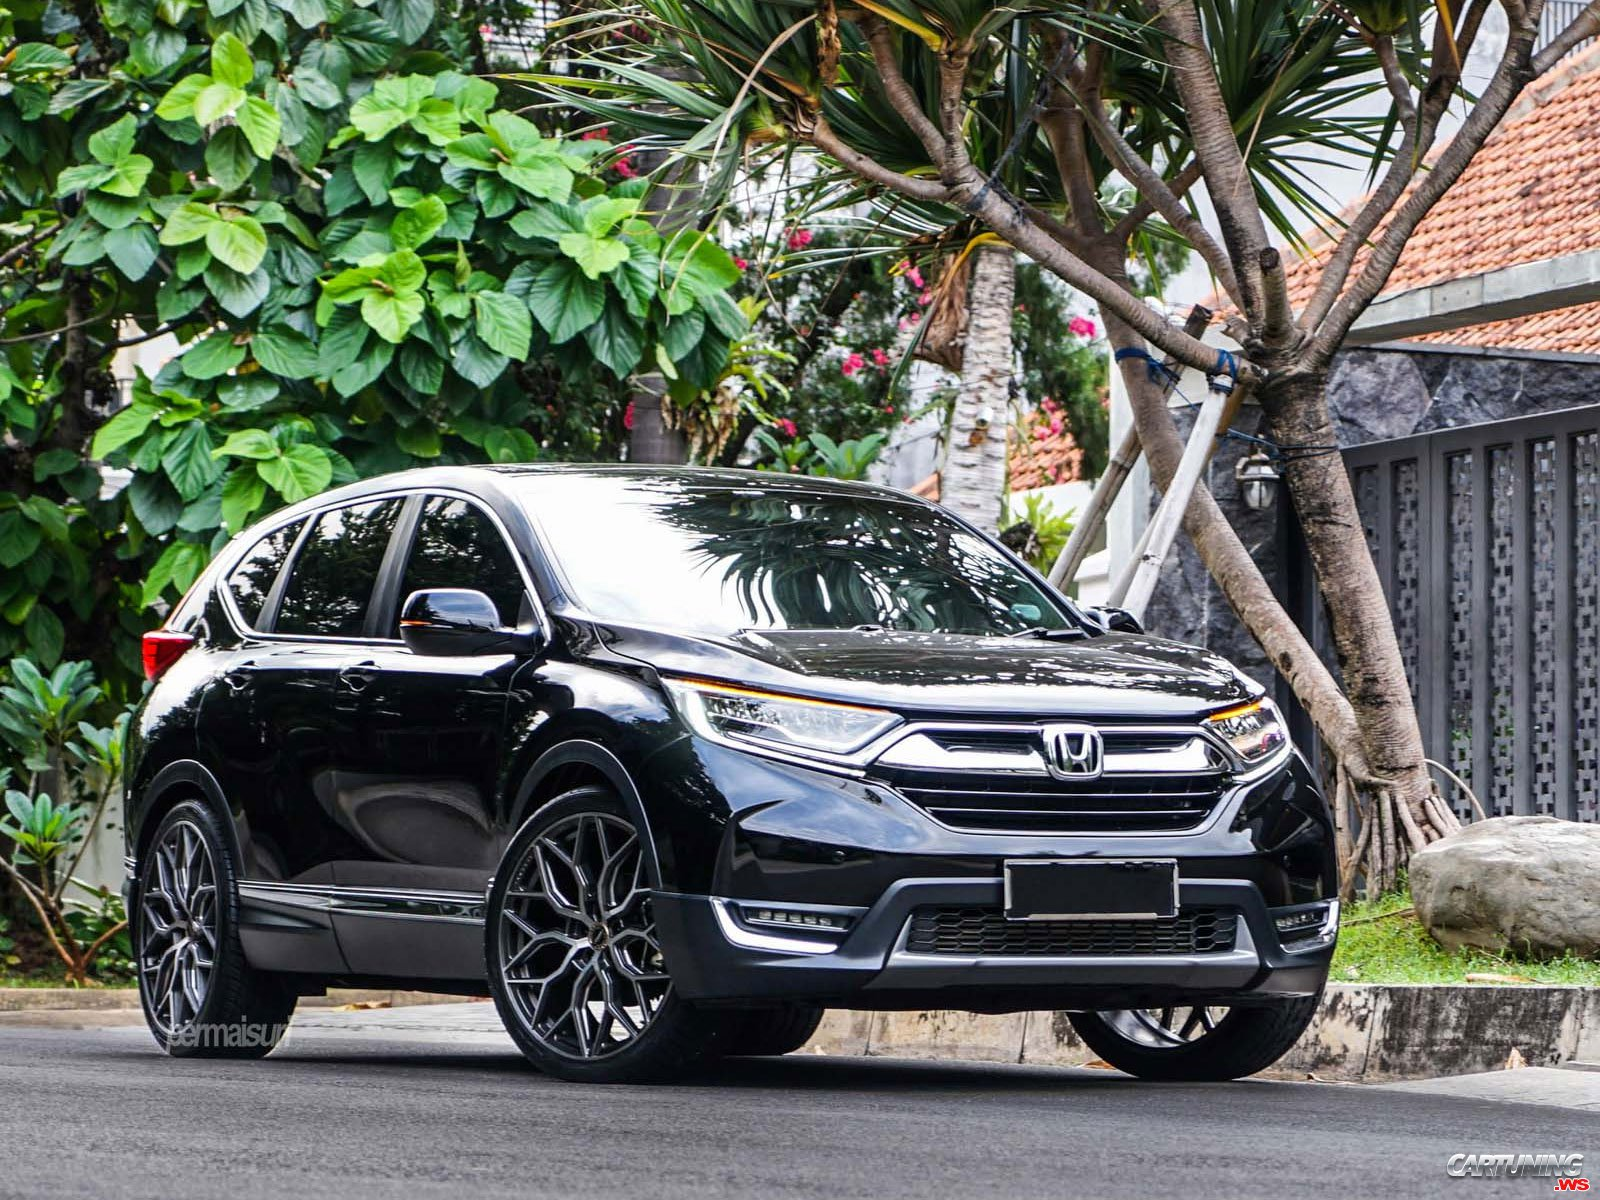 Tuning Honda Cr V 2019